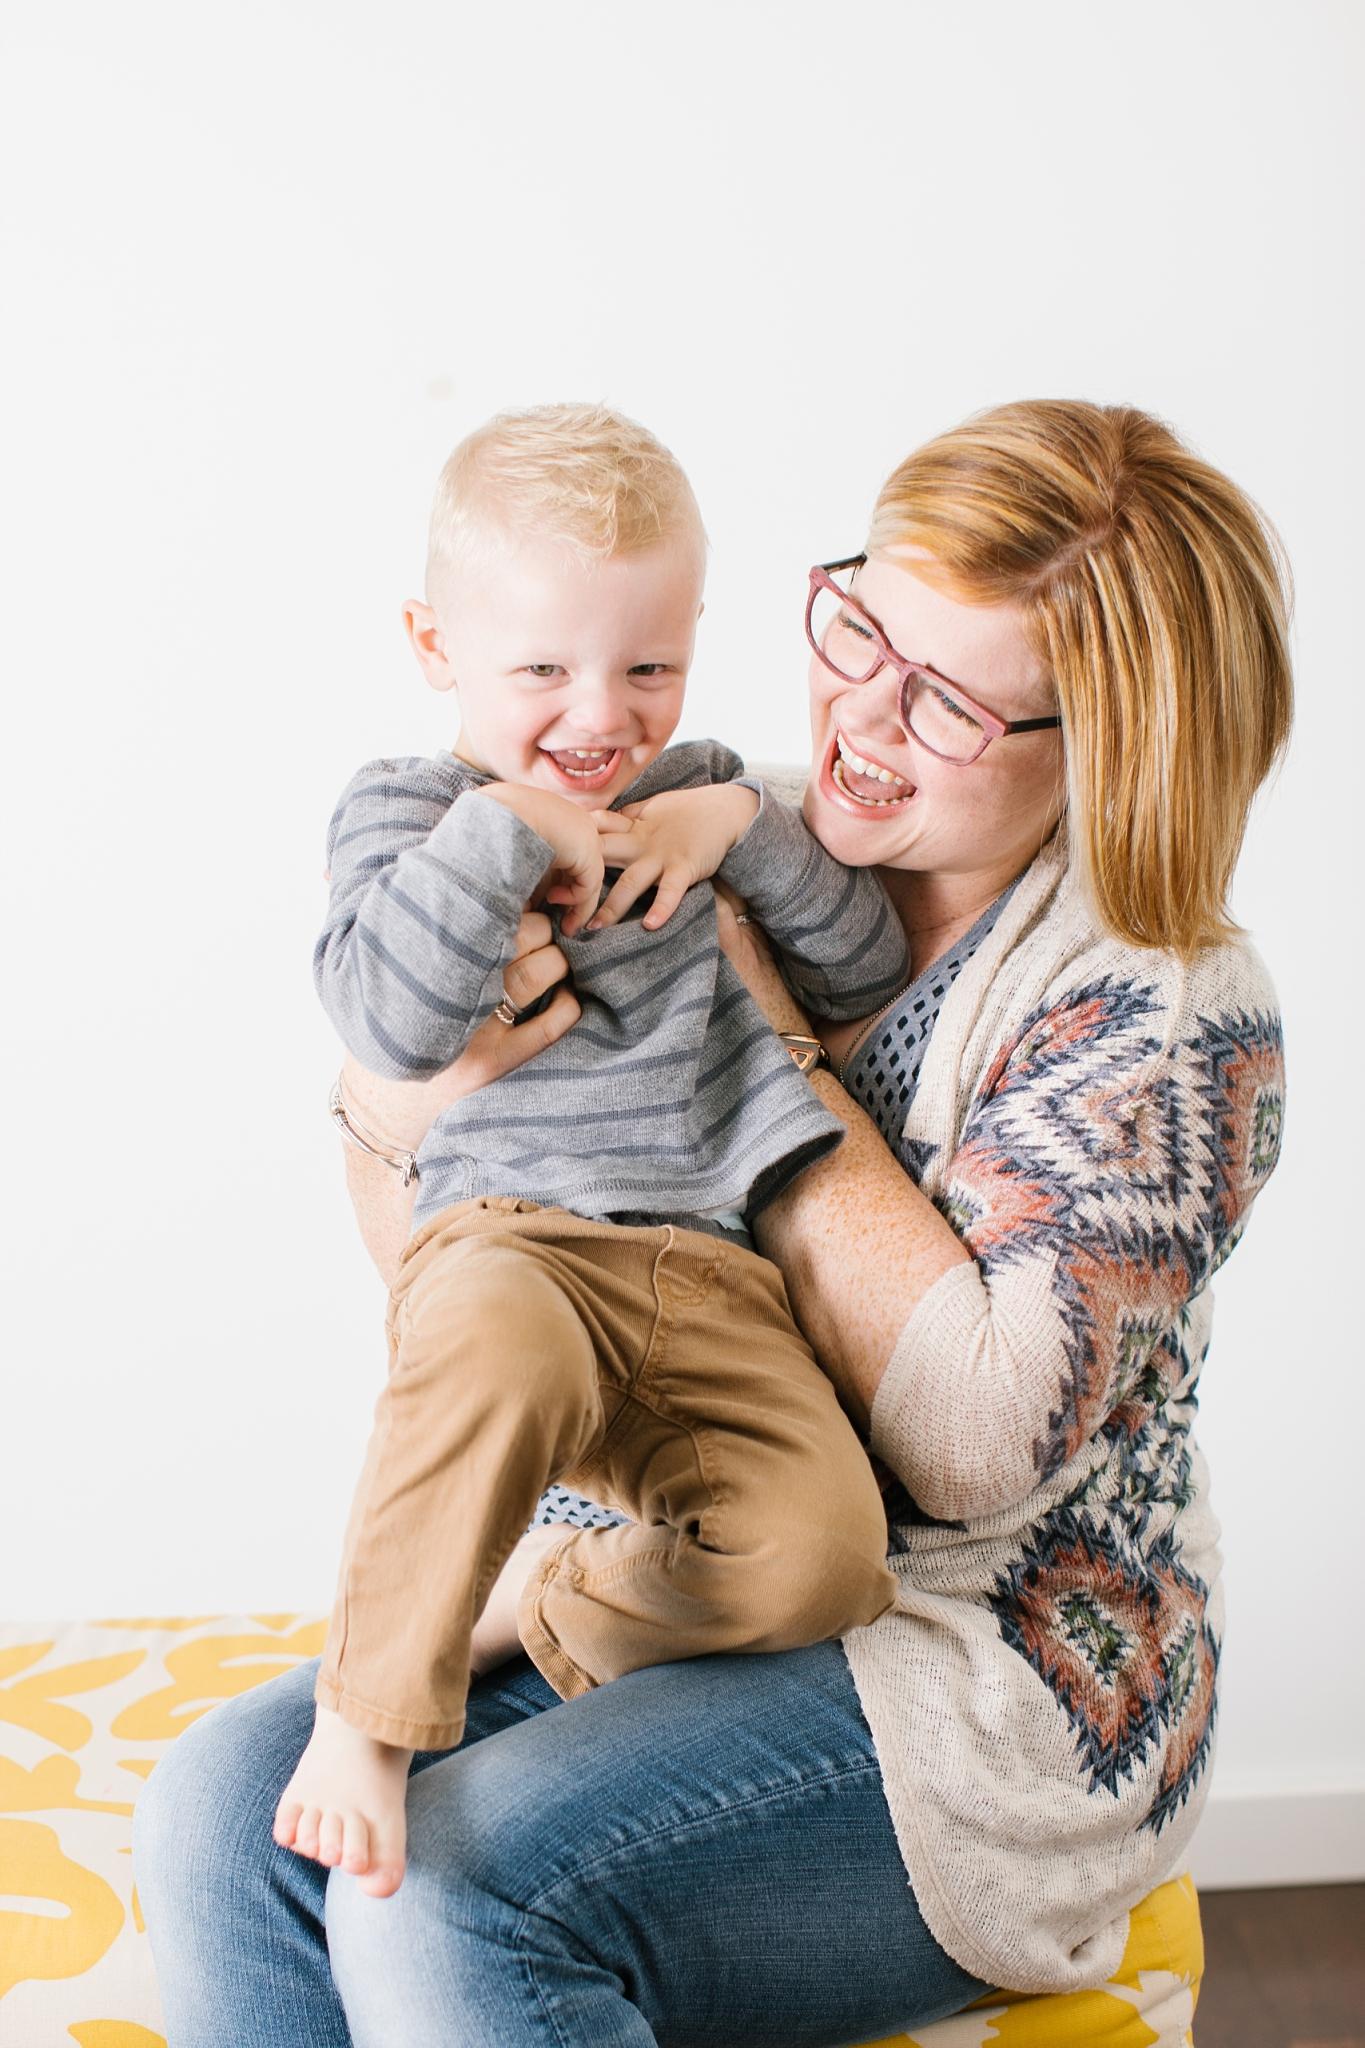 MommyandMe-31E_Lizzie-B-Imagery-Utah-Family-Photographer-Lifestyle-Photography-Salt-Lake-City-Park-City-Utah-County-Mommy-and-Me-Mini-Session-Studio.jpg